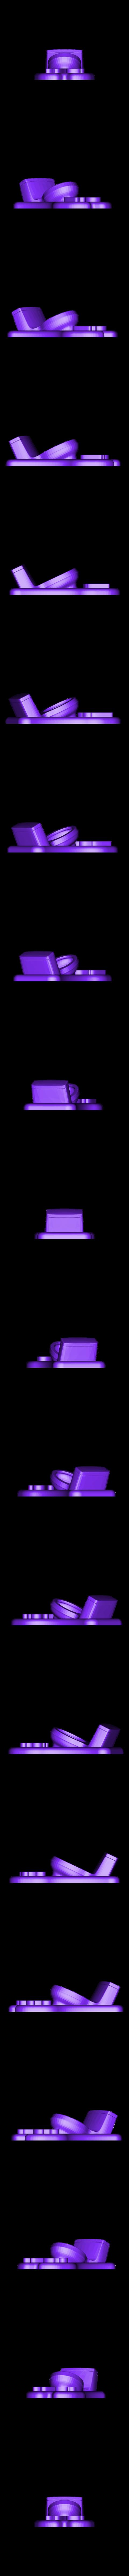 Toilet Door.stl Download STL file WC Sign • 3D printing design, Tomshik3D